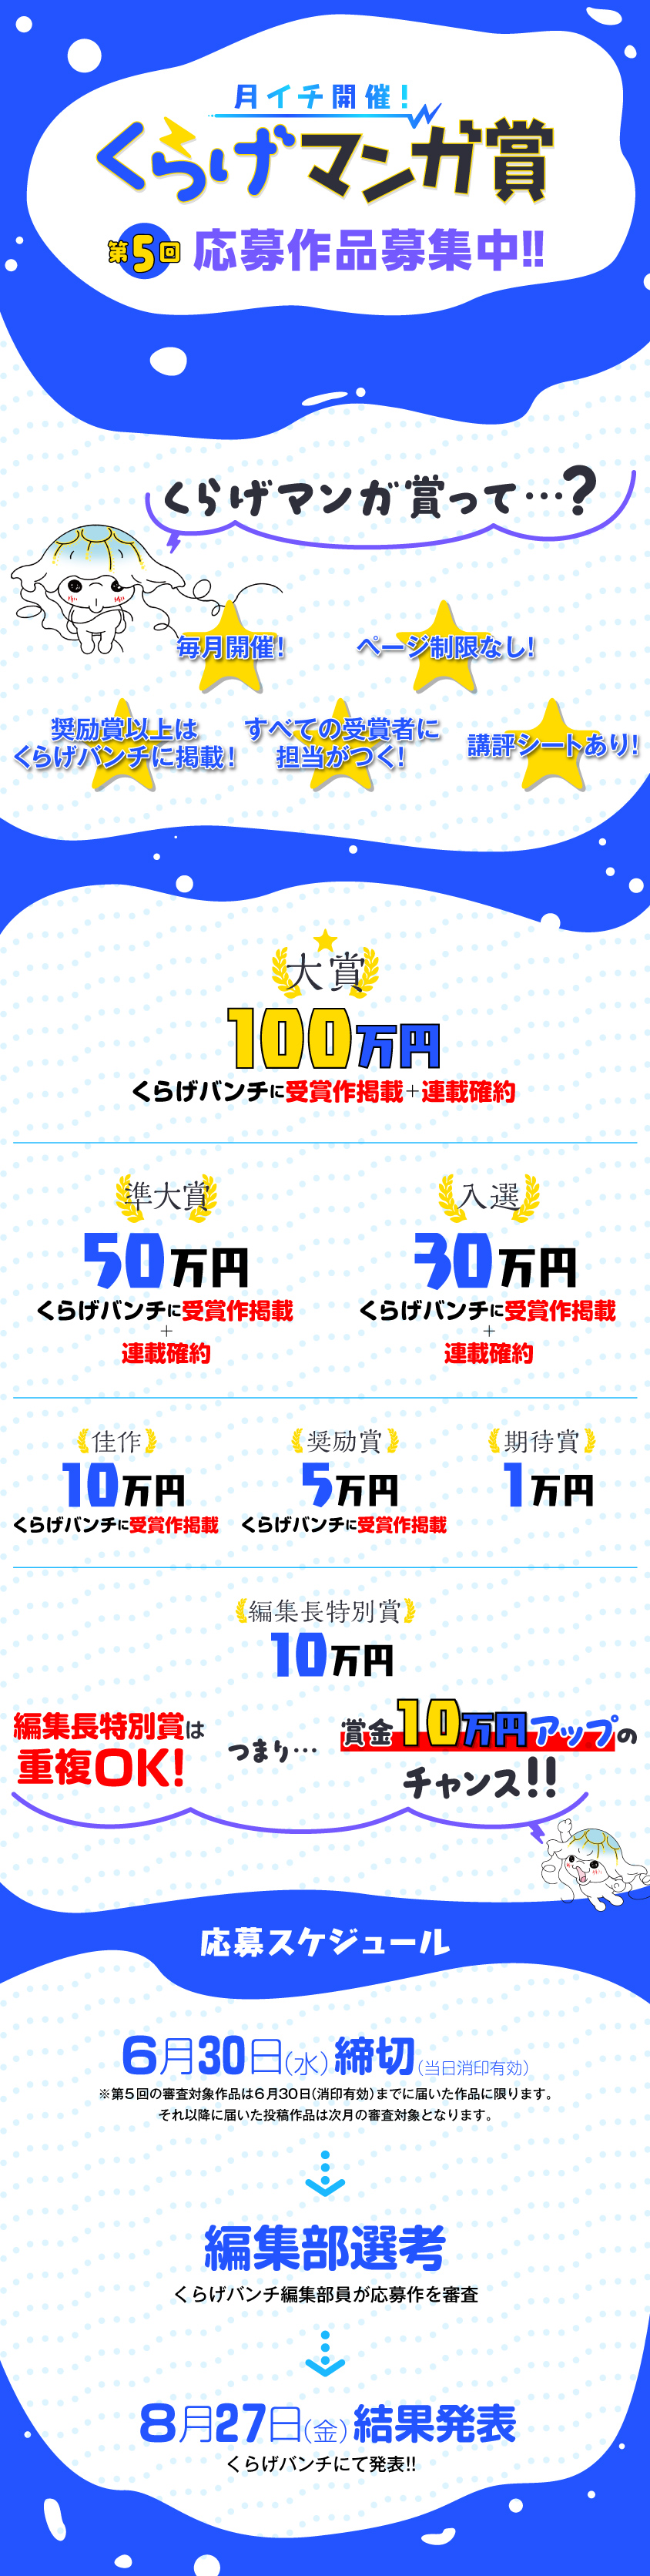 f:id:kuragebunch:20210520131627j:plain